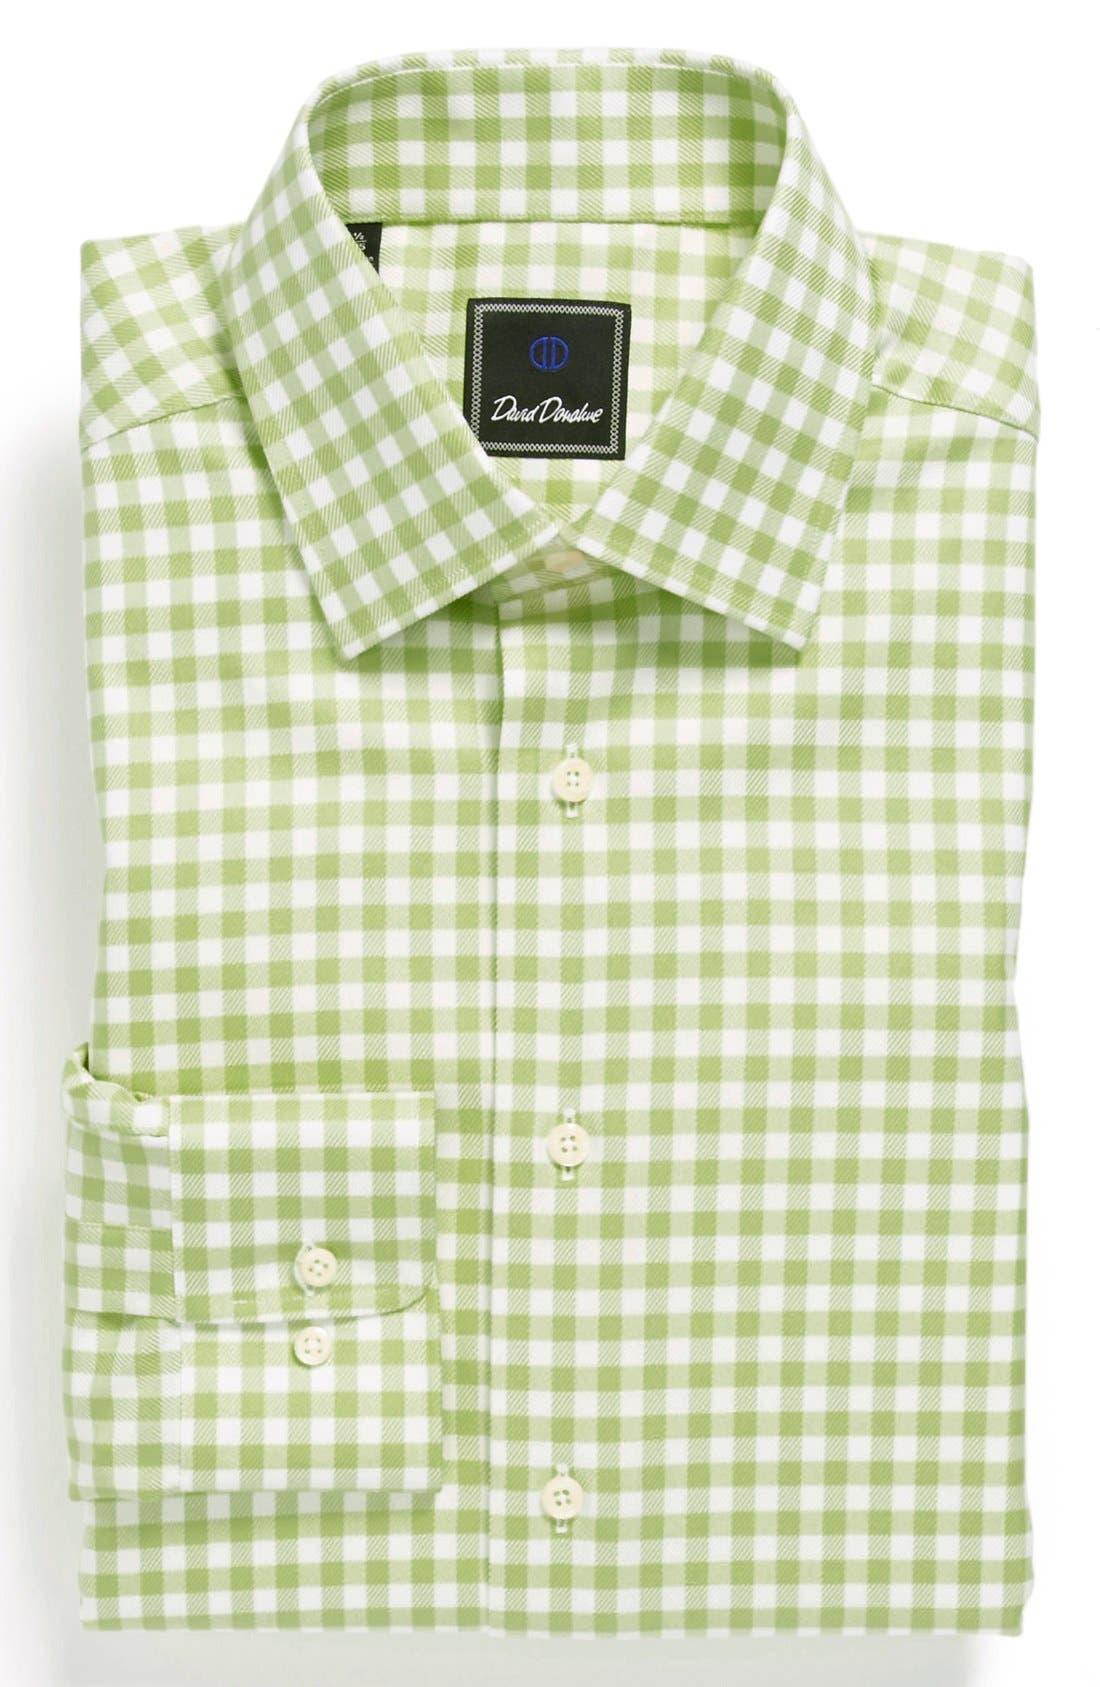 Main Image - David Donahue Twill Gingham Regular Fit Dress Shirt